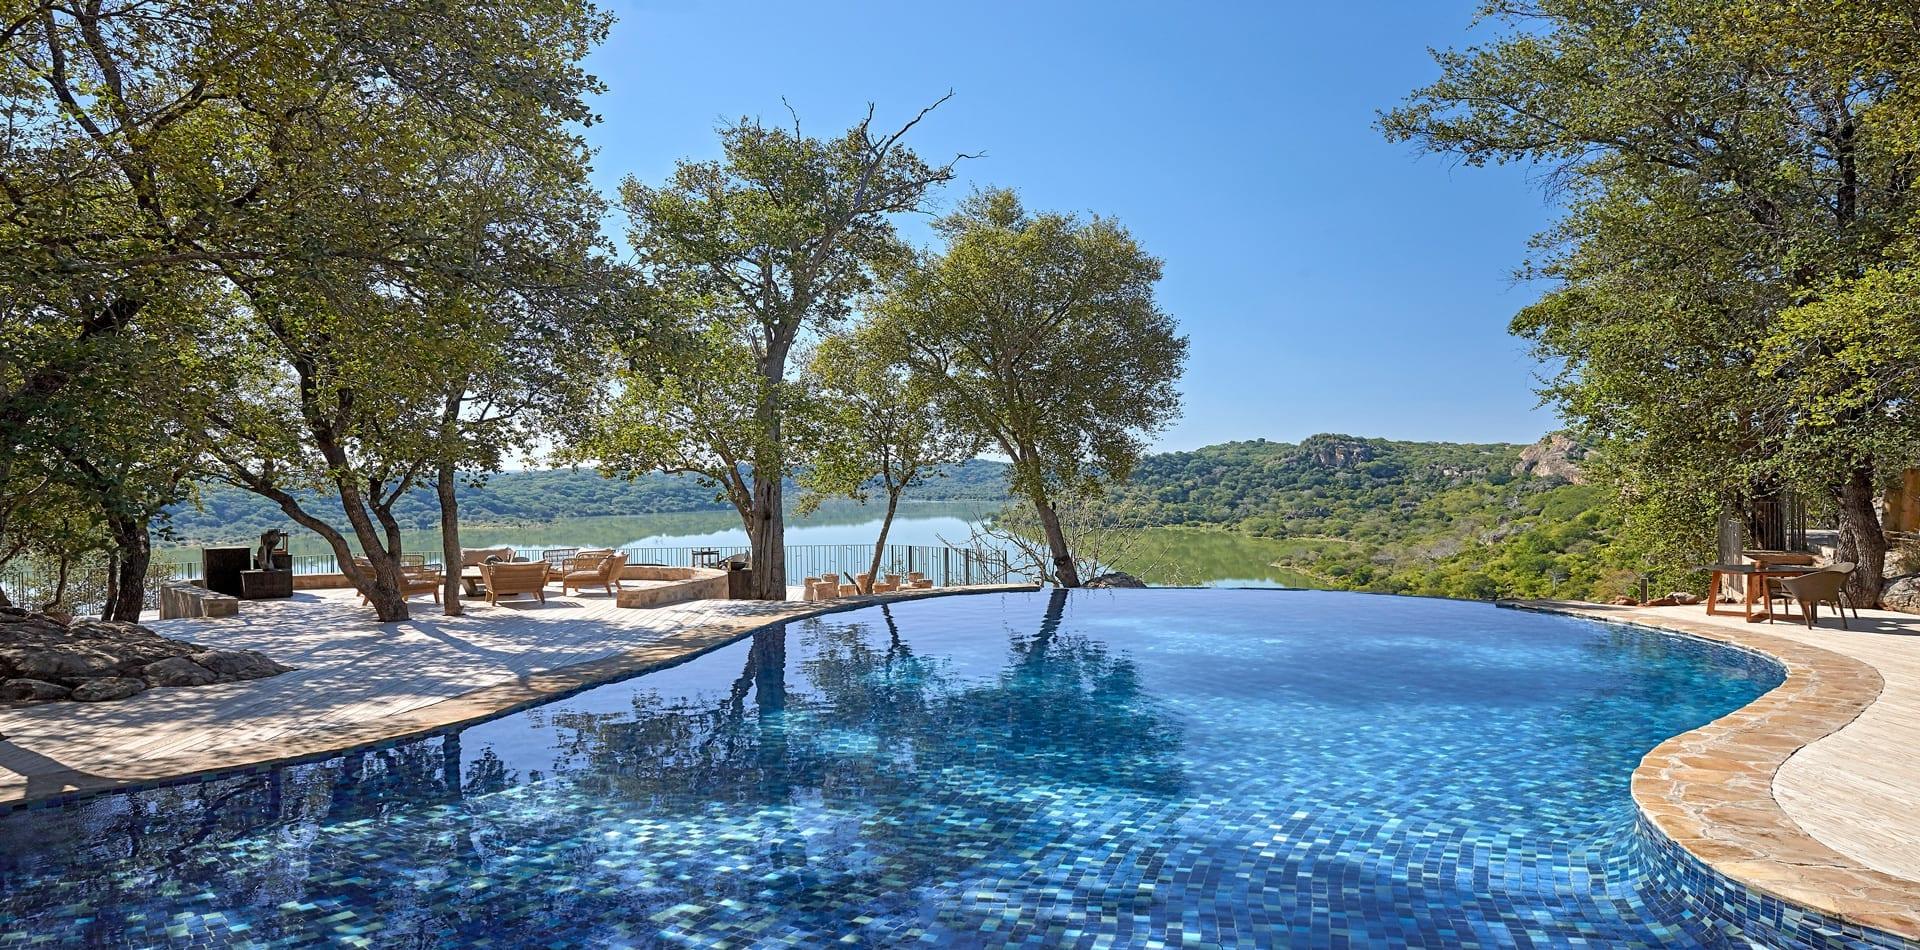 pamushana lodge swimming pool zimbabwe